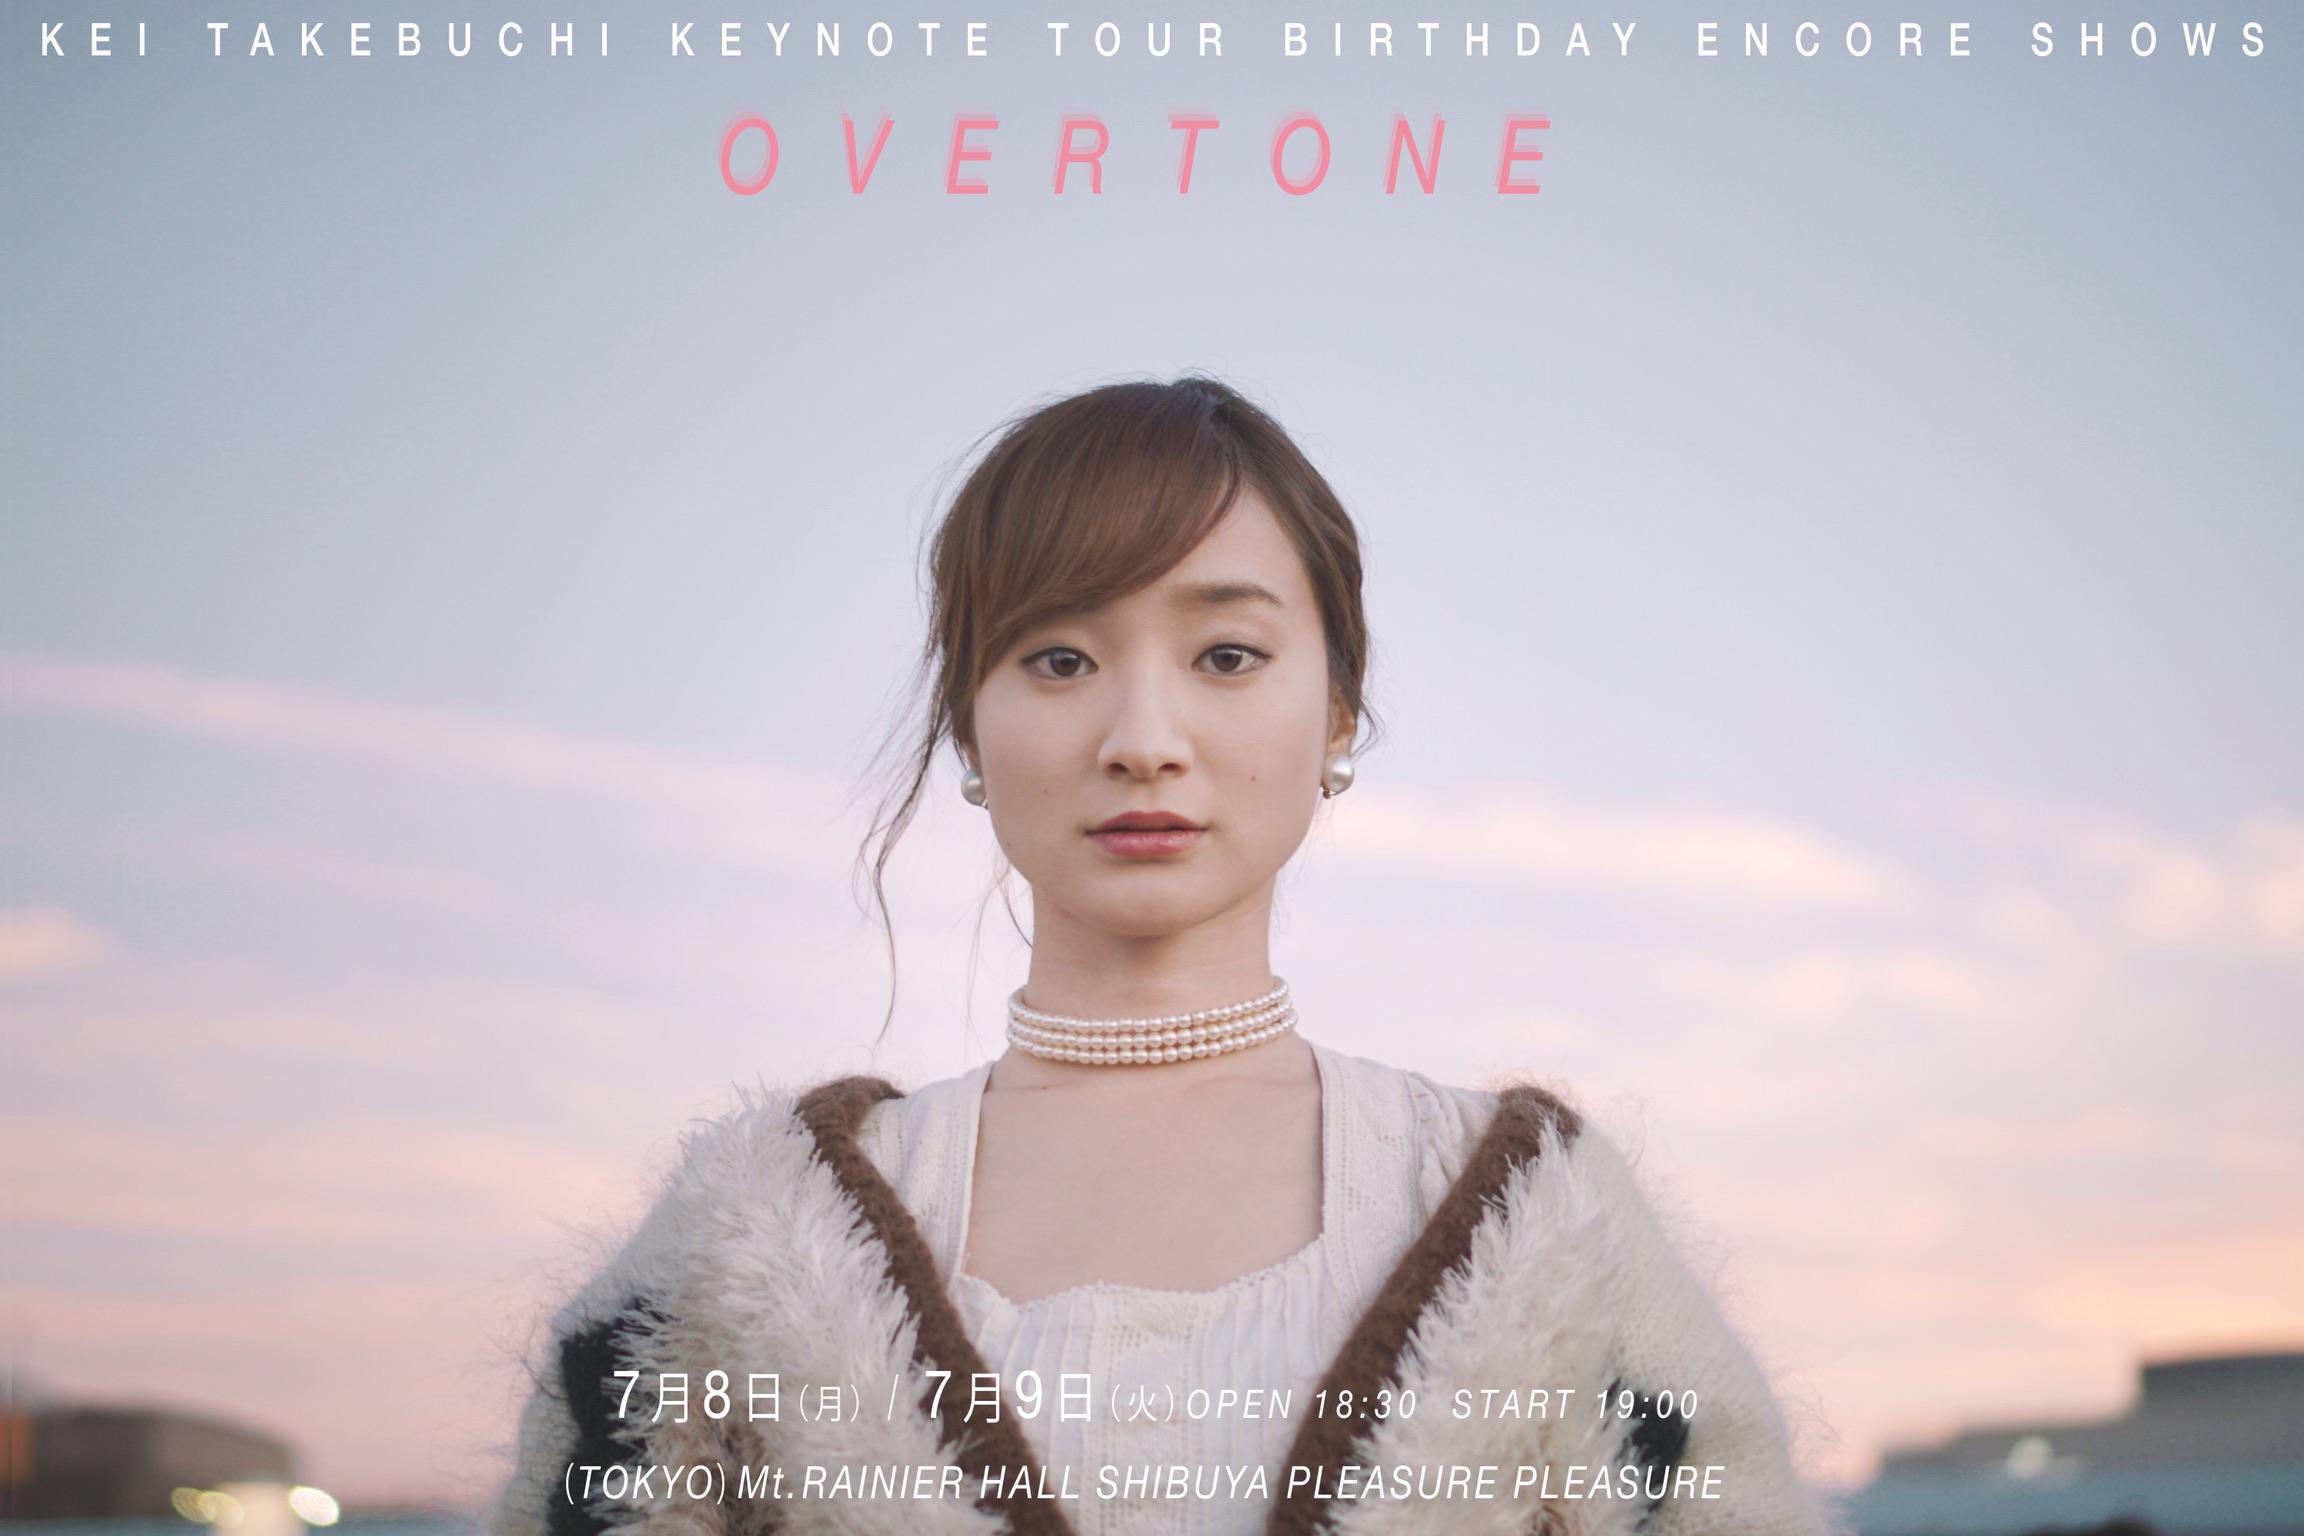 竹渕慶 KEYNOTE Birthday追加公演 -OVERTONE- Day 1